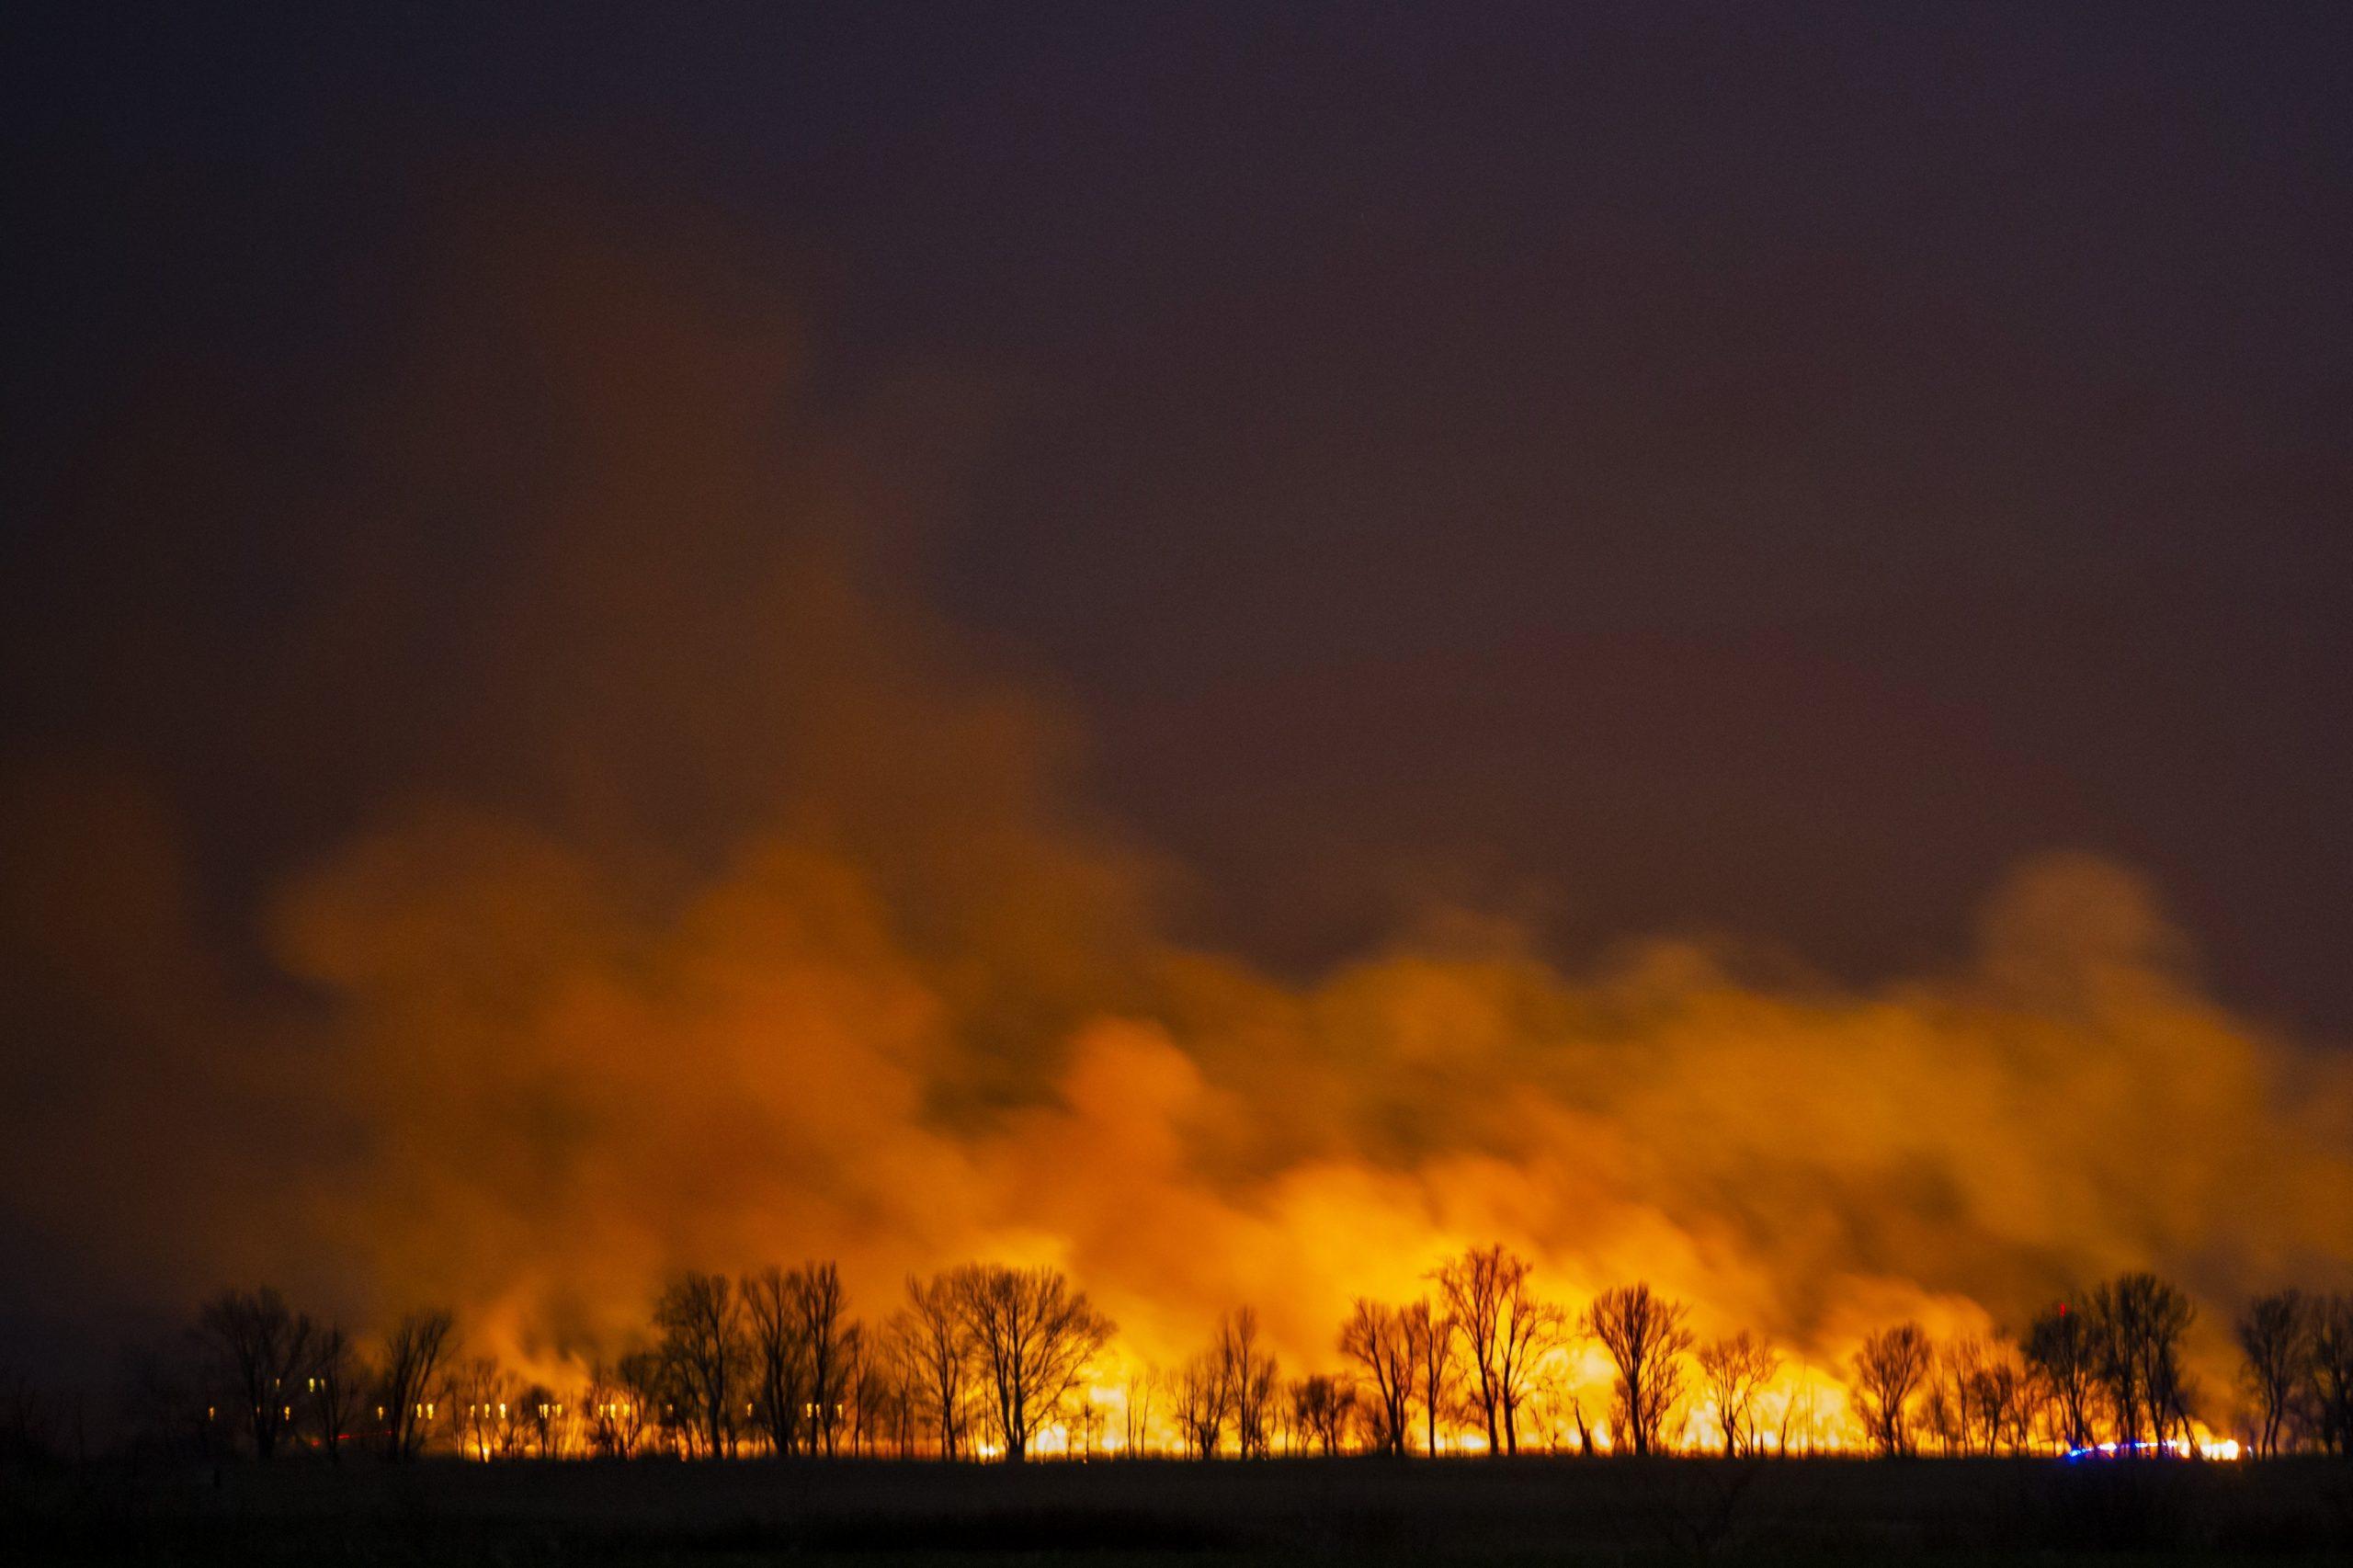 Riesiger Schilfbrand am Balaton